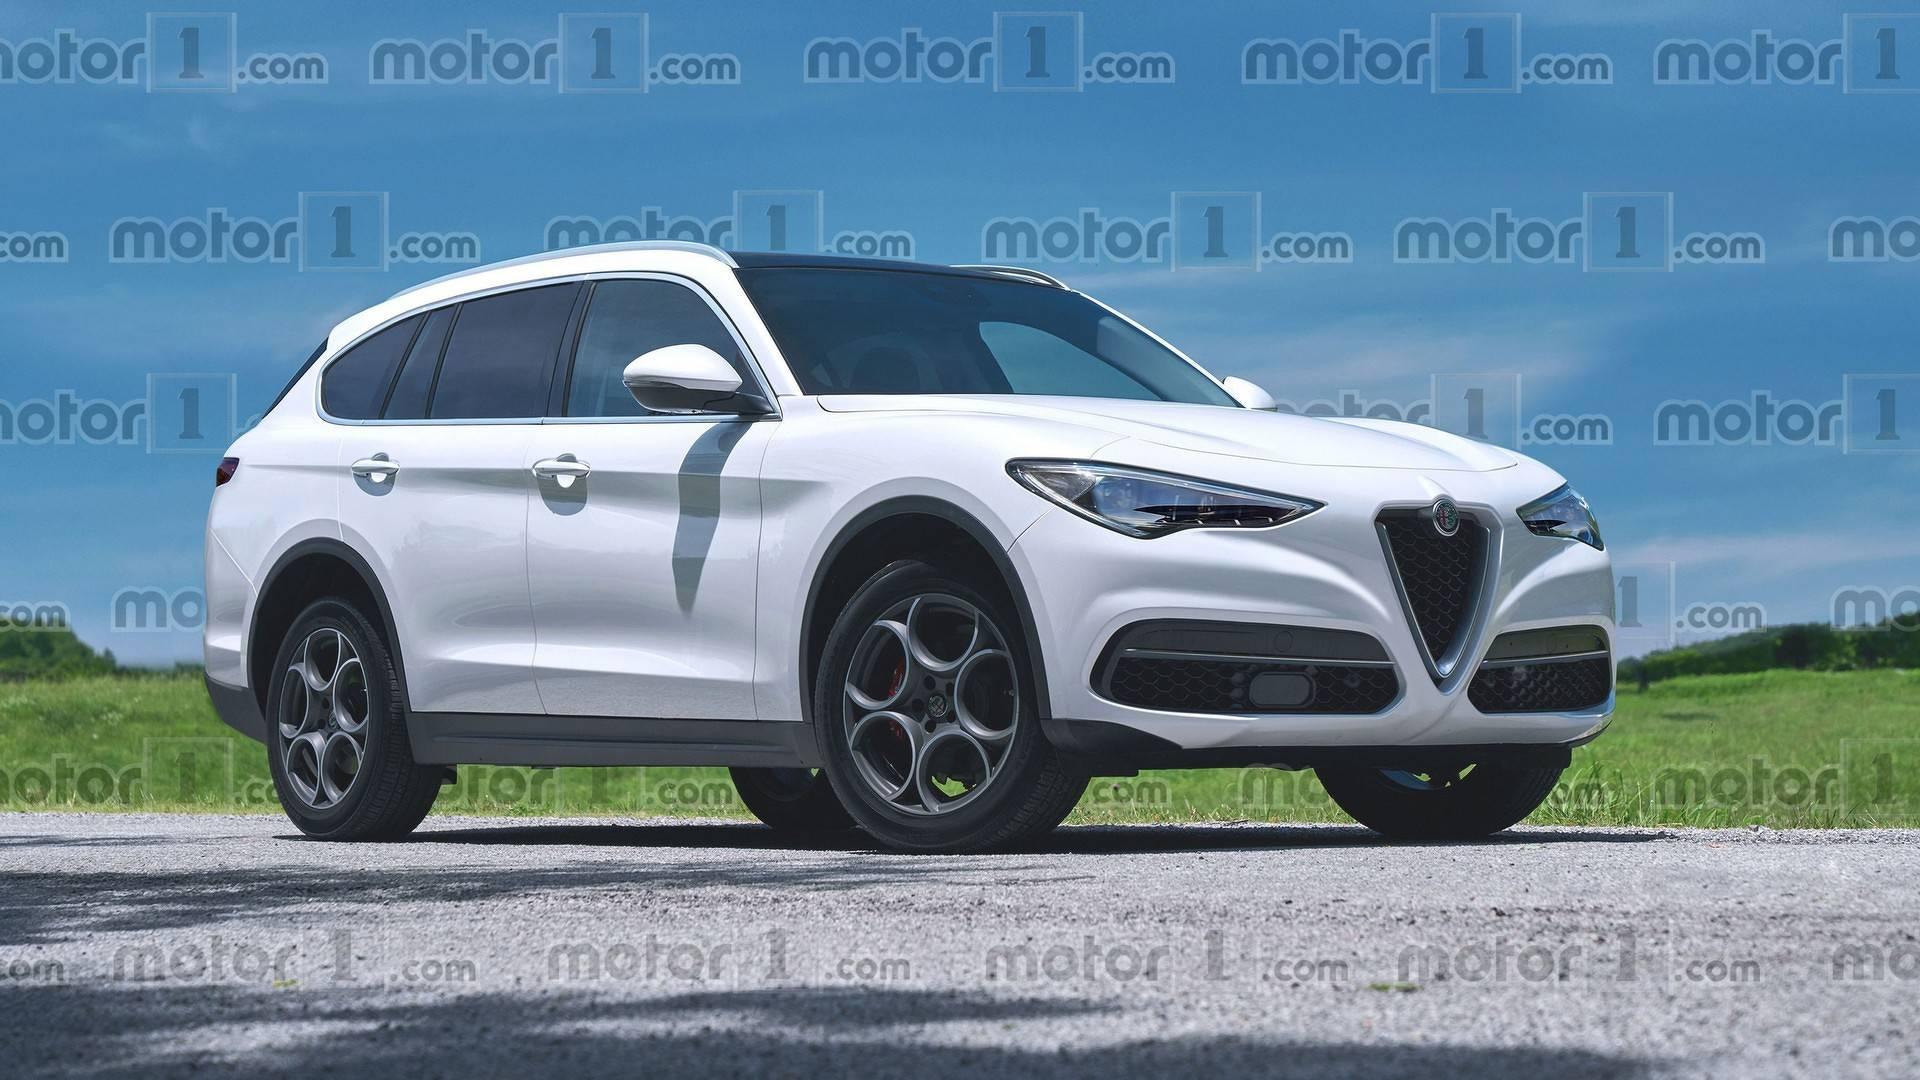 Alfa Romeo Confirmed Large Suv Imagined As Stelvio S Big Brother